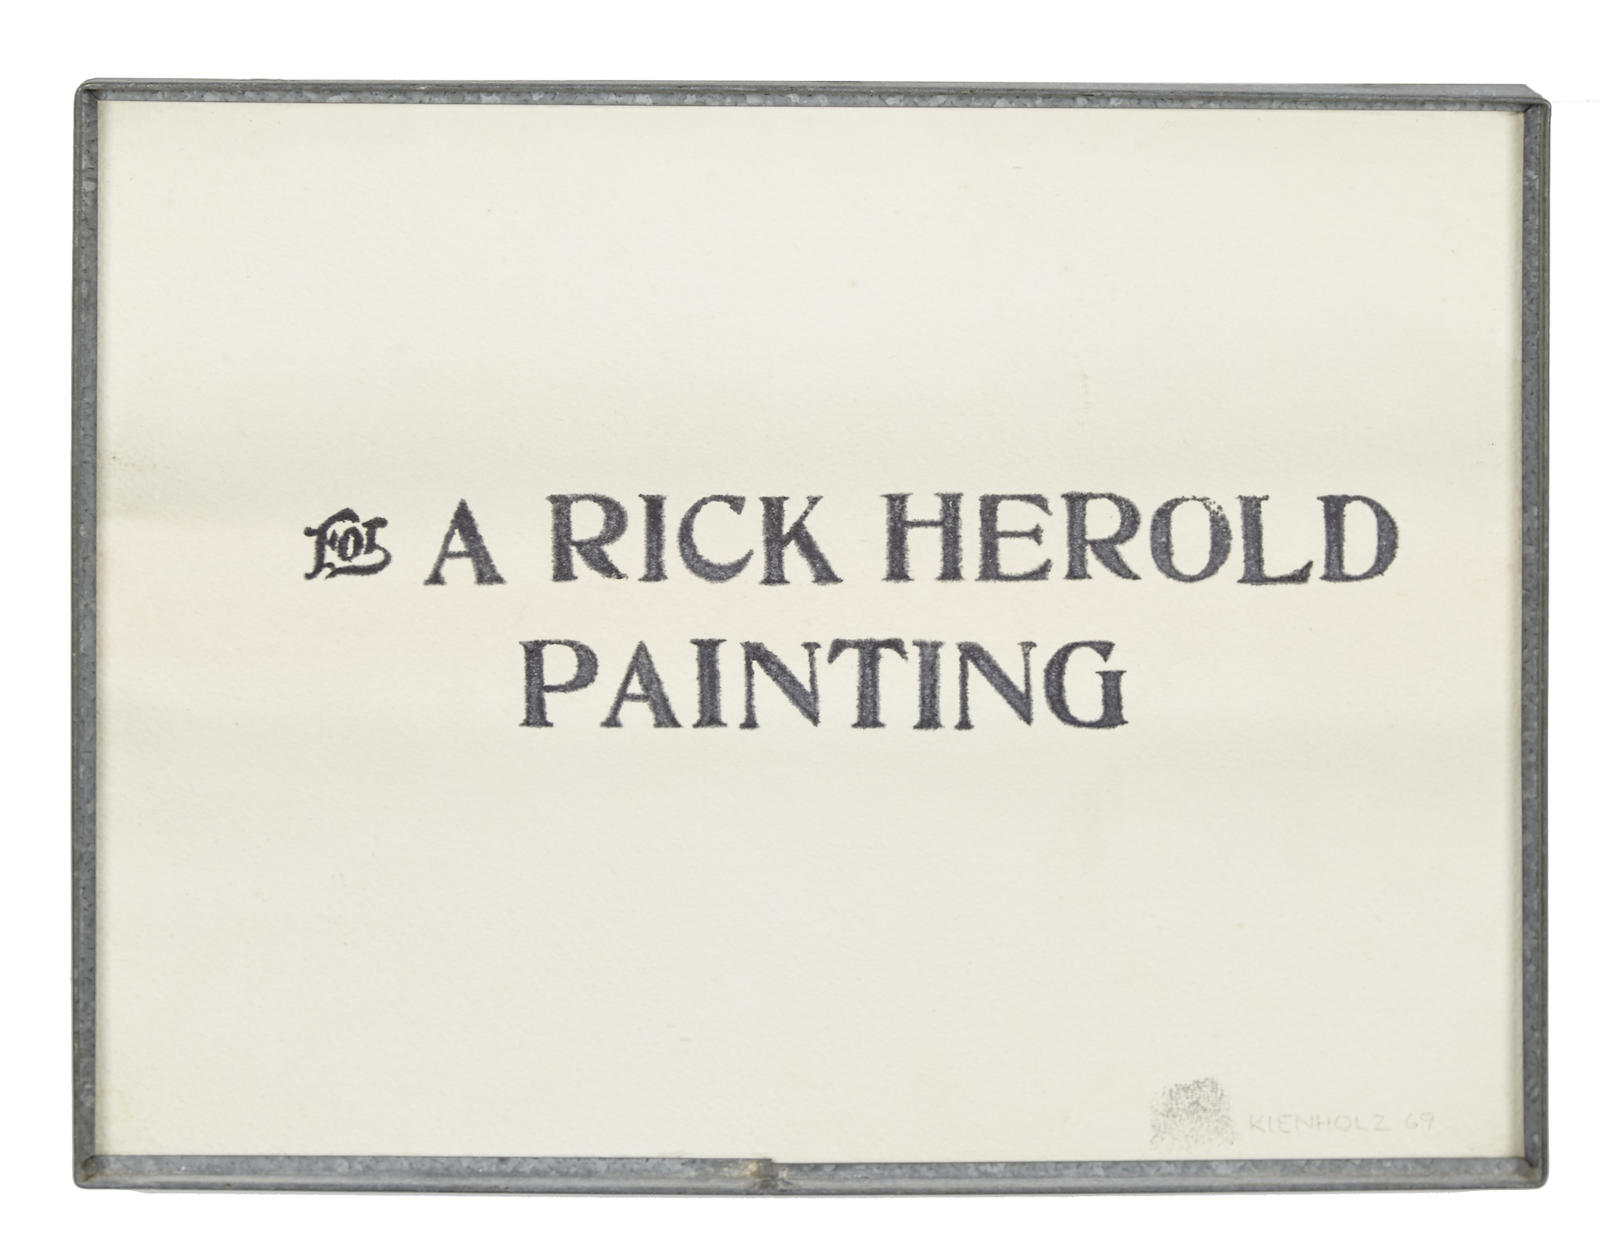 Edward Kienholz-For A Rick Herold Painting-1969